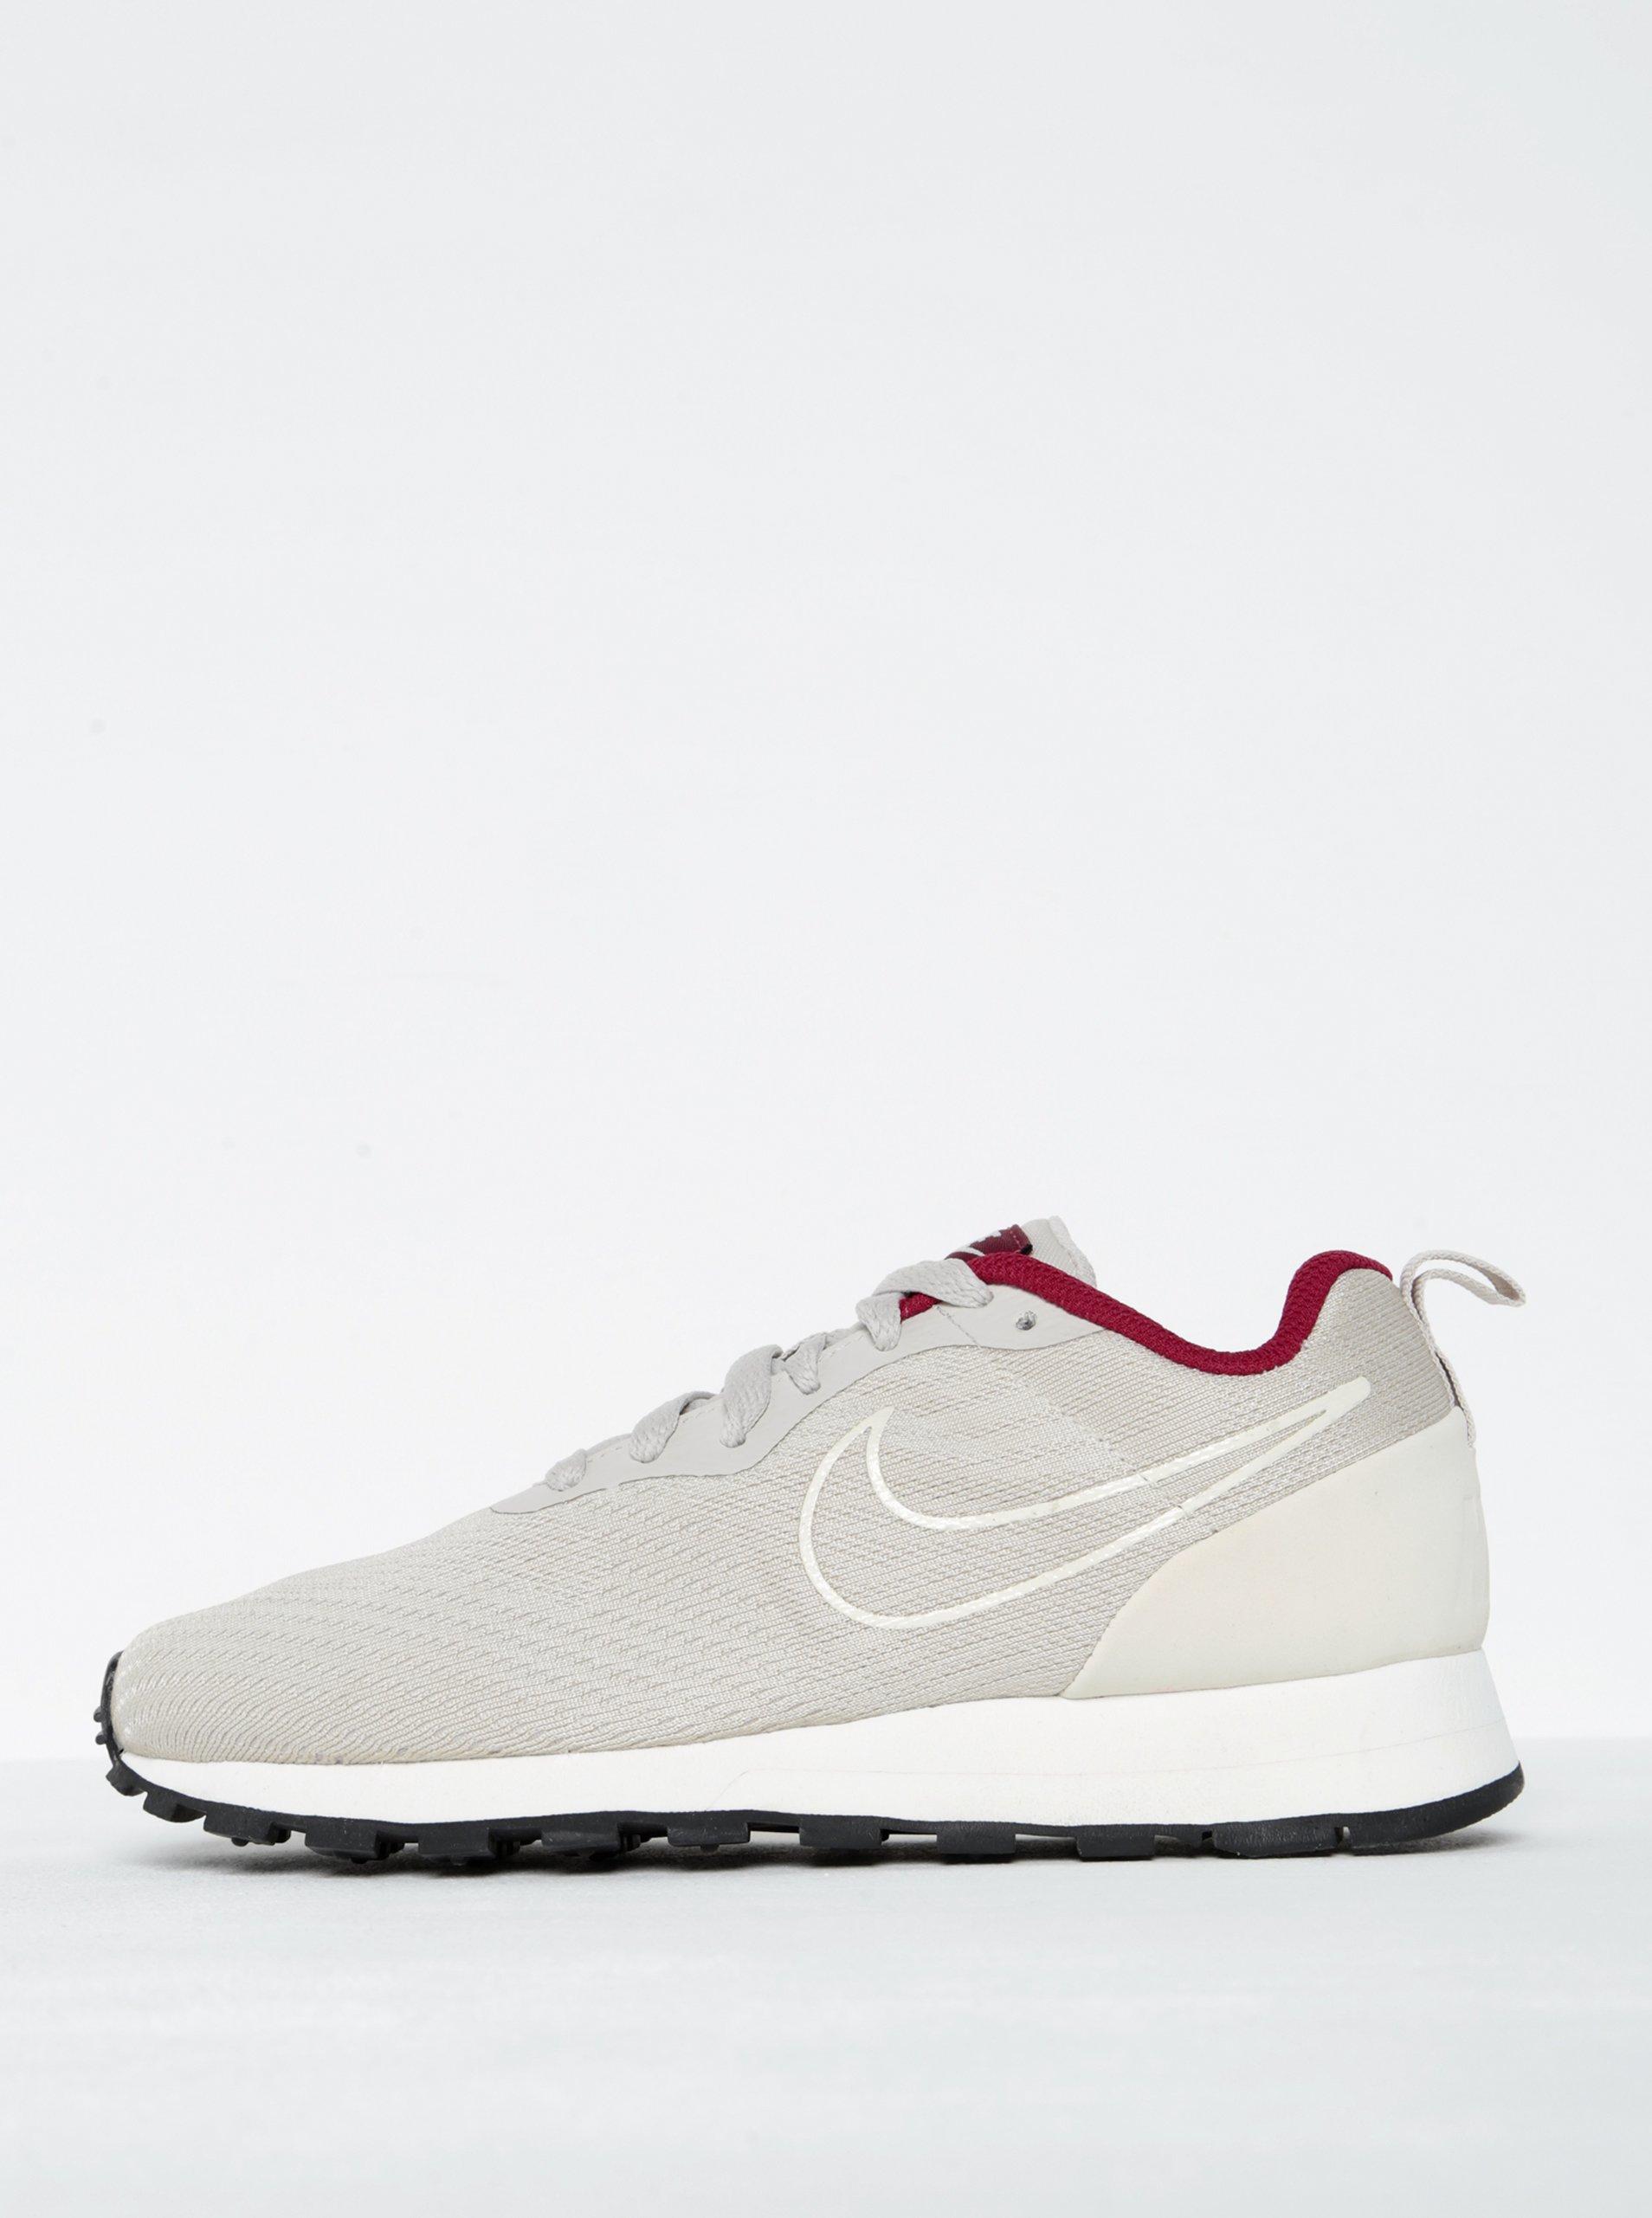 Béžové dámské tenisky Nike Mid Runner 2 ENG Mesh